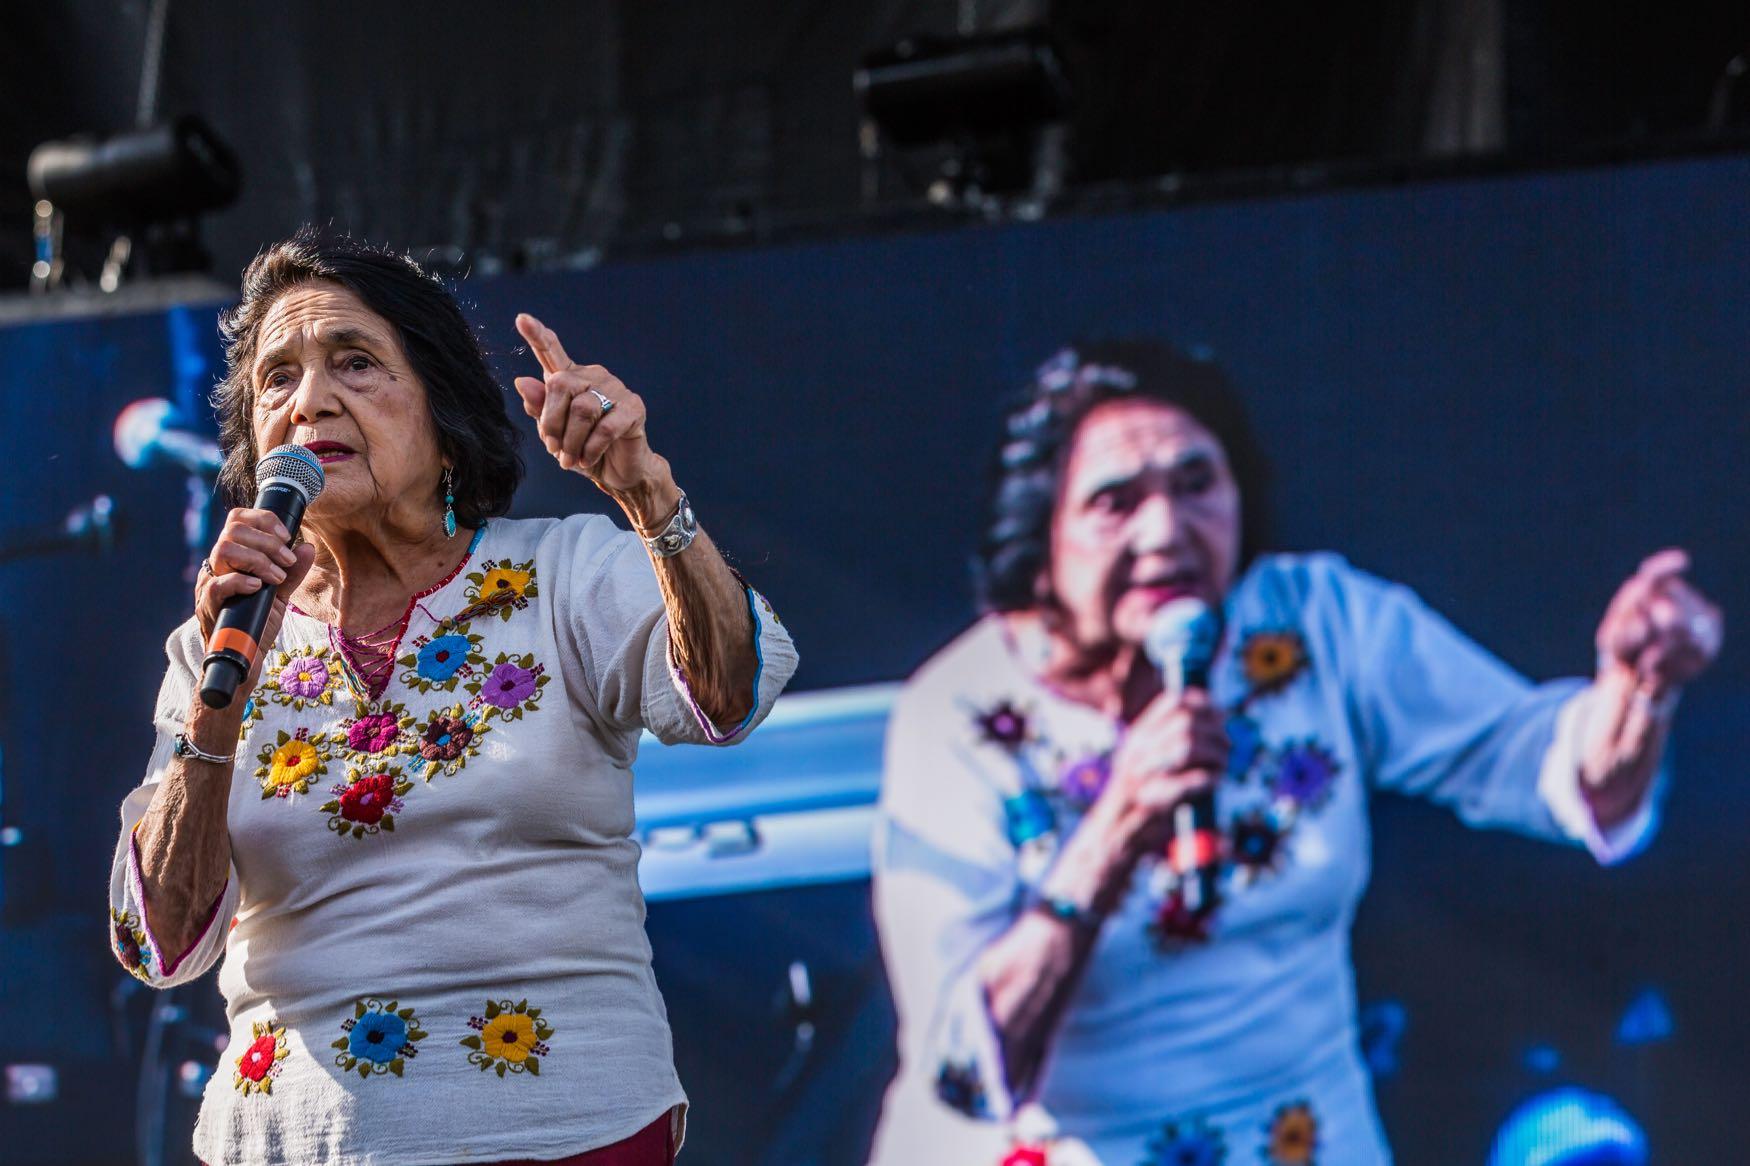 Dolores Huerta, YOLA DÍA (Atmosphere) @ L.A. Historic Park 8/18/19. Photo by Derrick K. Lee, Esq. (@Methodman13) for www.BlurredCulture.com.